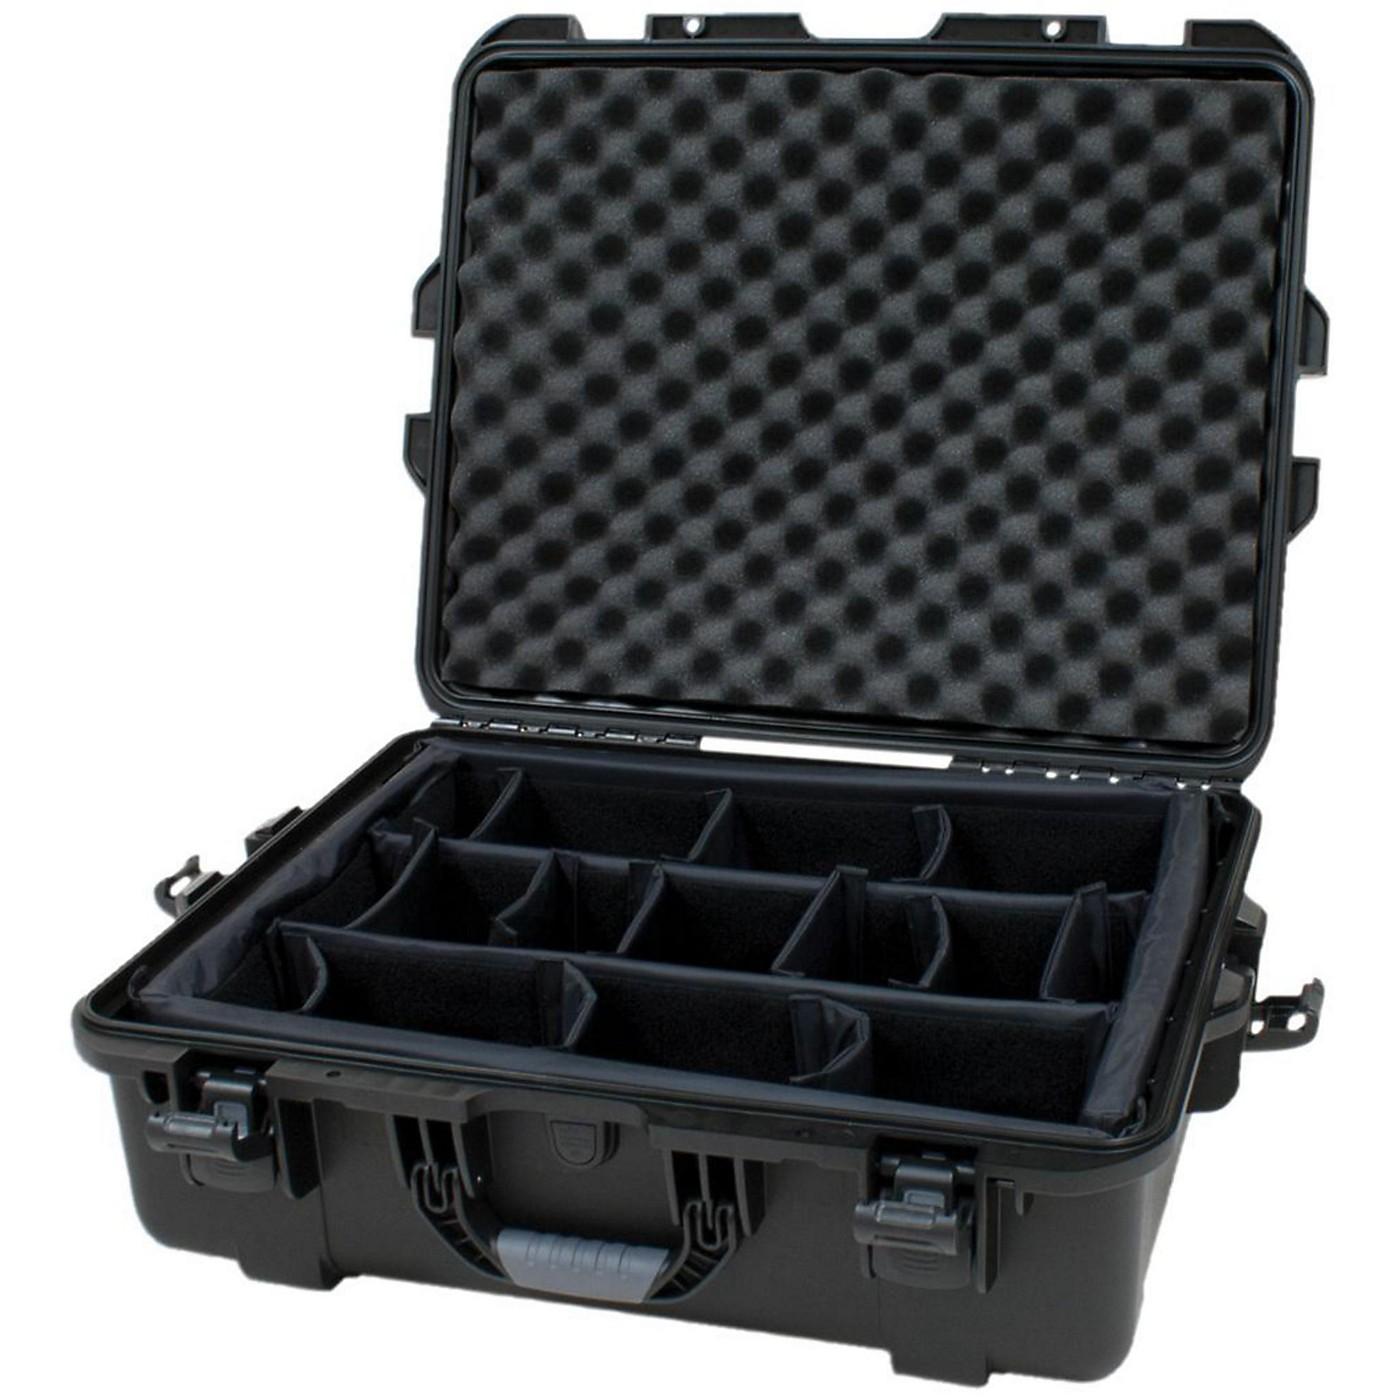 Gator GU-2217-08-WPDV Waterproof Injection Molded Case thumbnail